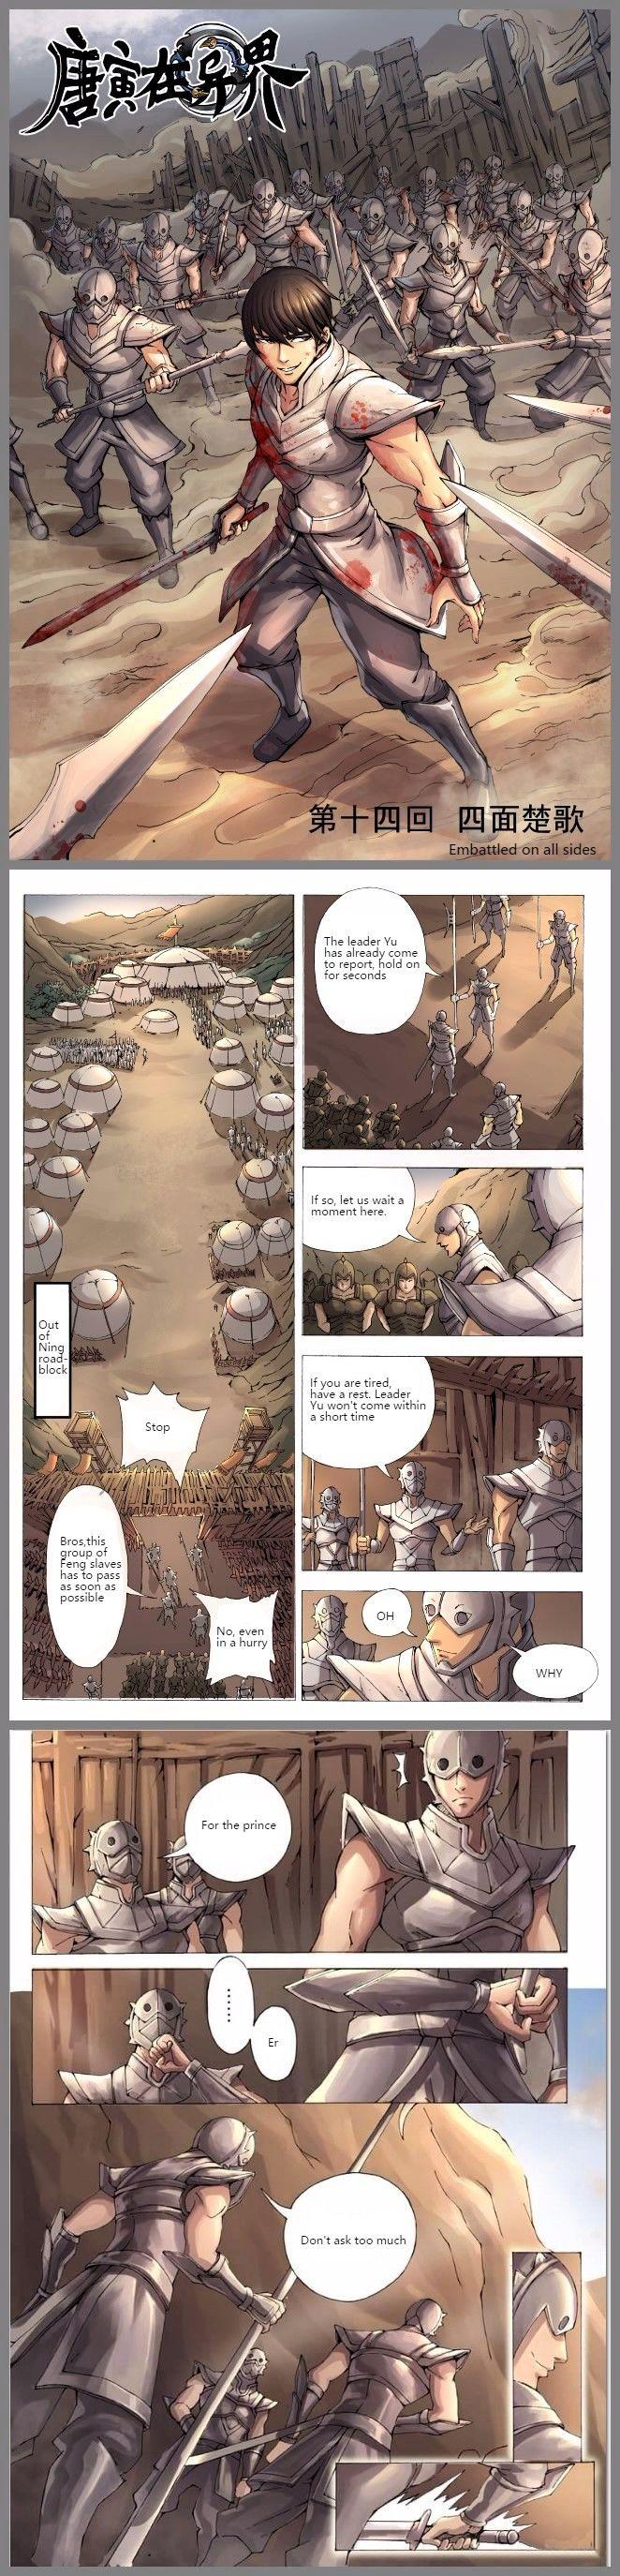 https://im.nineanime.com/comics/pic9/4/19716/367365/cf4f35ee546a6d8fe9461b8db8a8200a.jpg Page 1